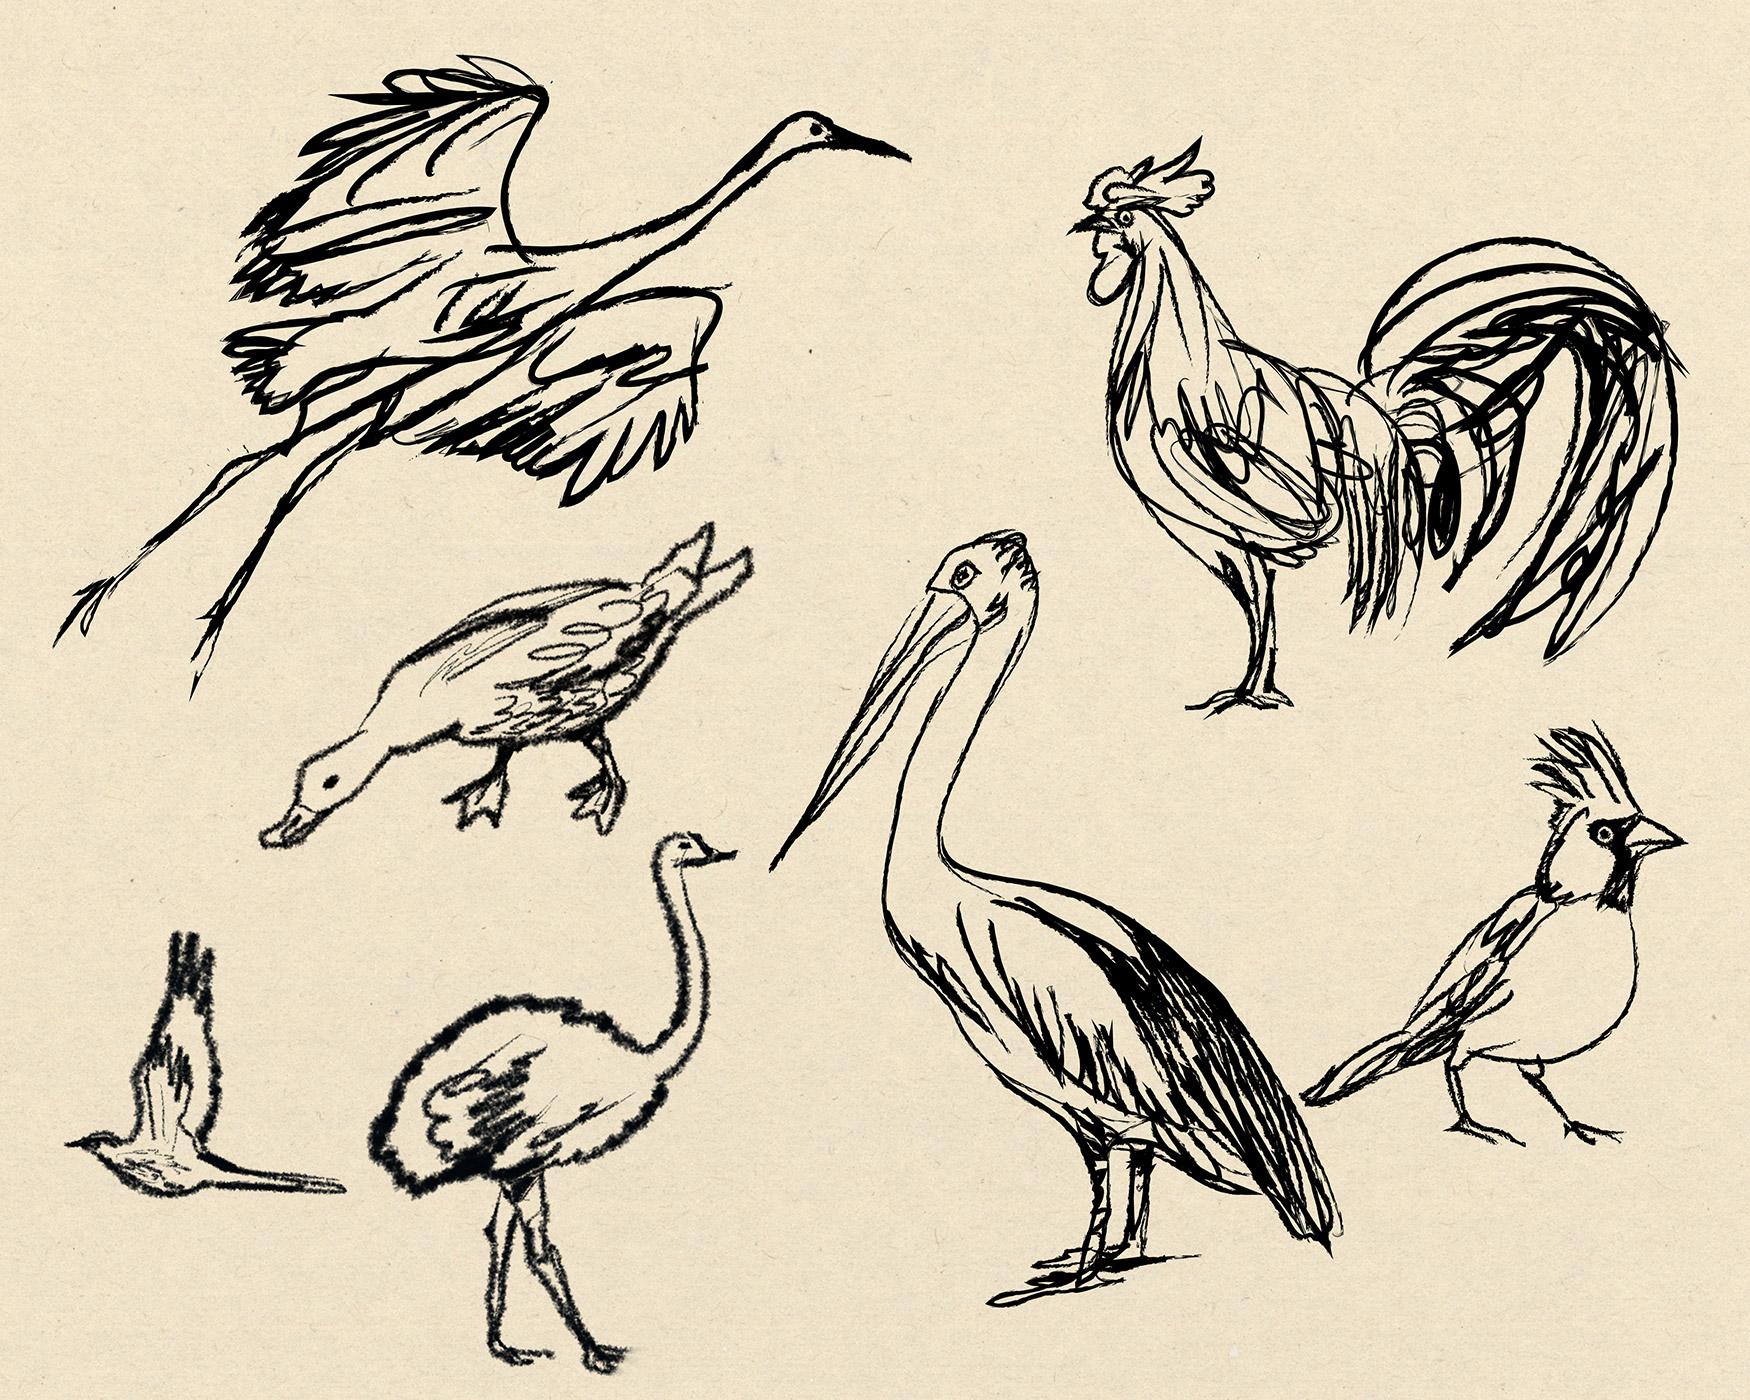 sketches of various birds… created quickly in black line by illustrator Steven Salerno. Visit stevensalerno.com